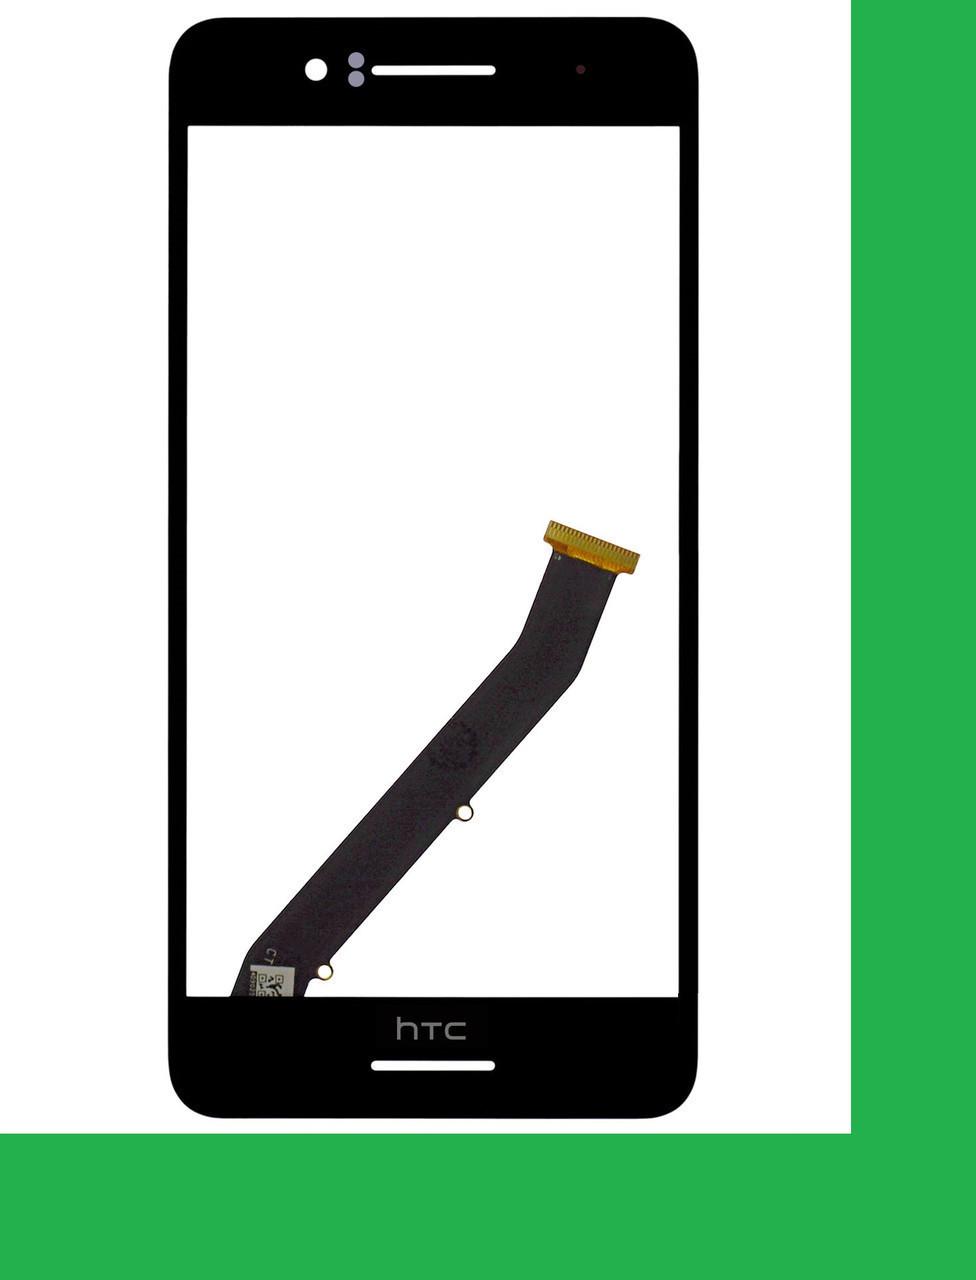 HTC Desire 728G, HTC 728G, 728G Dual Тачскрин (сенсор) чёрный